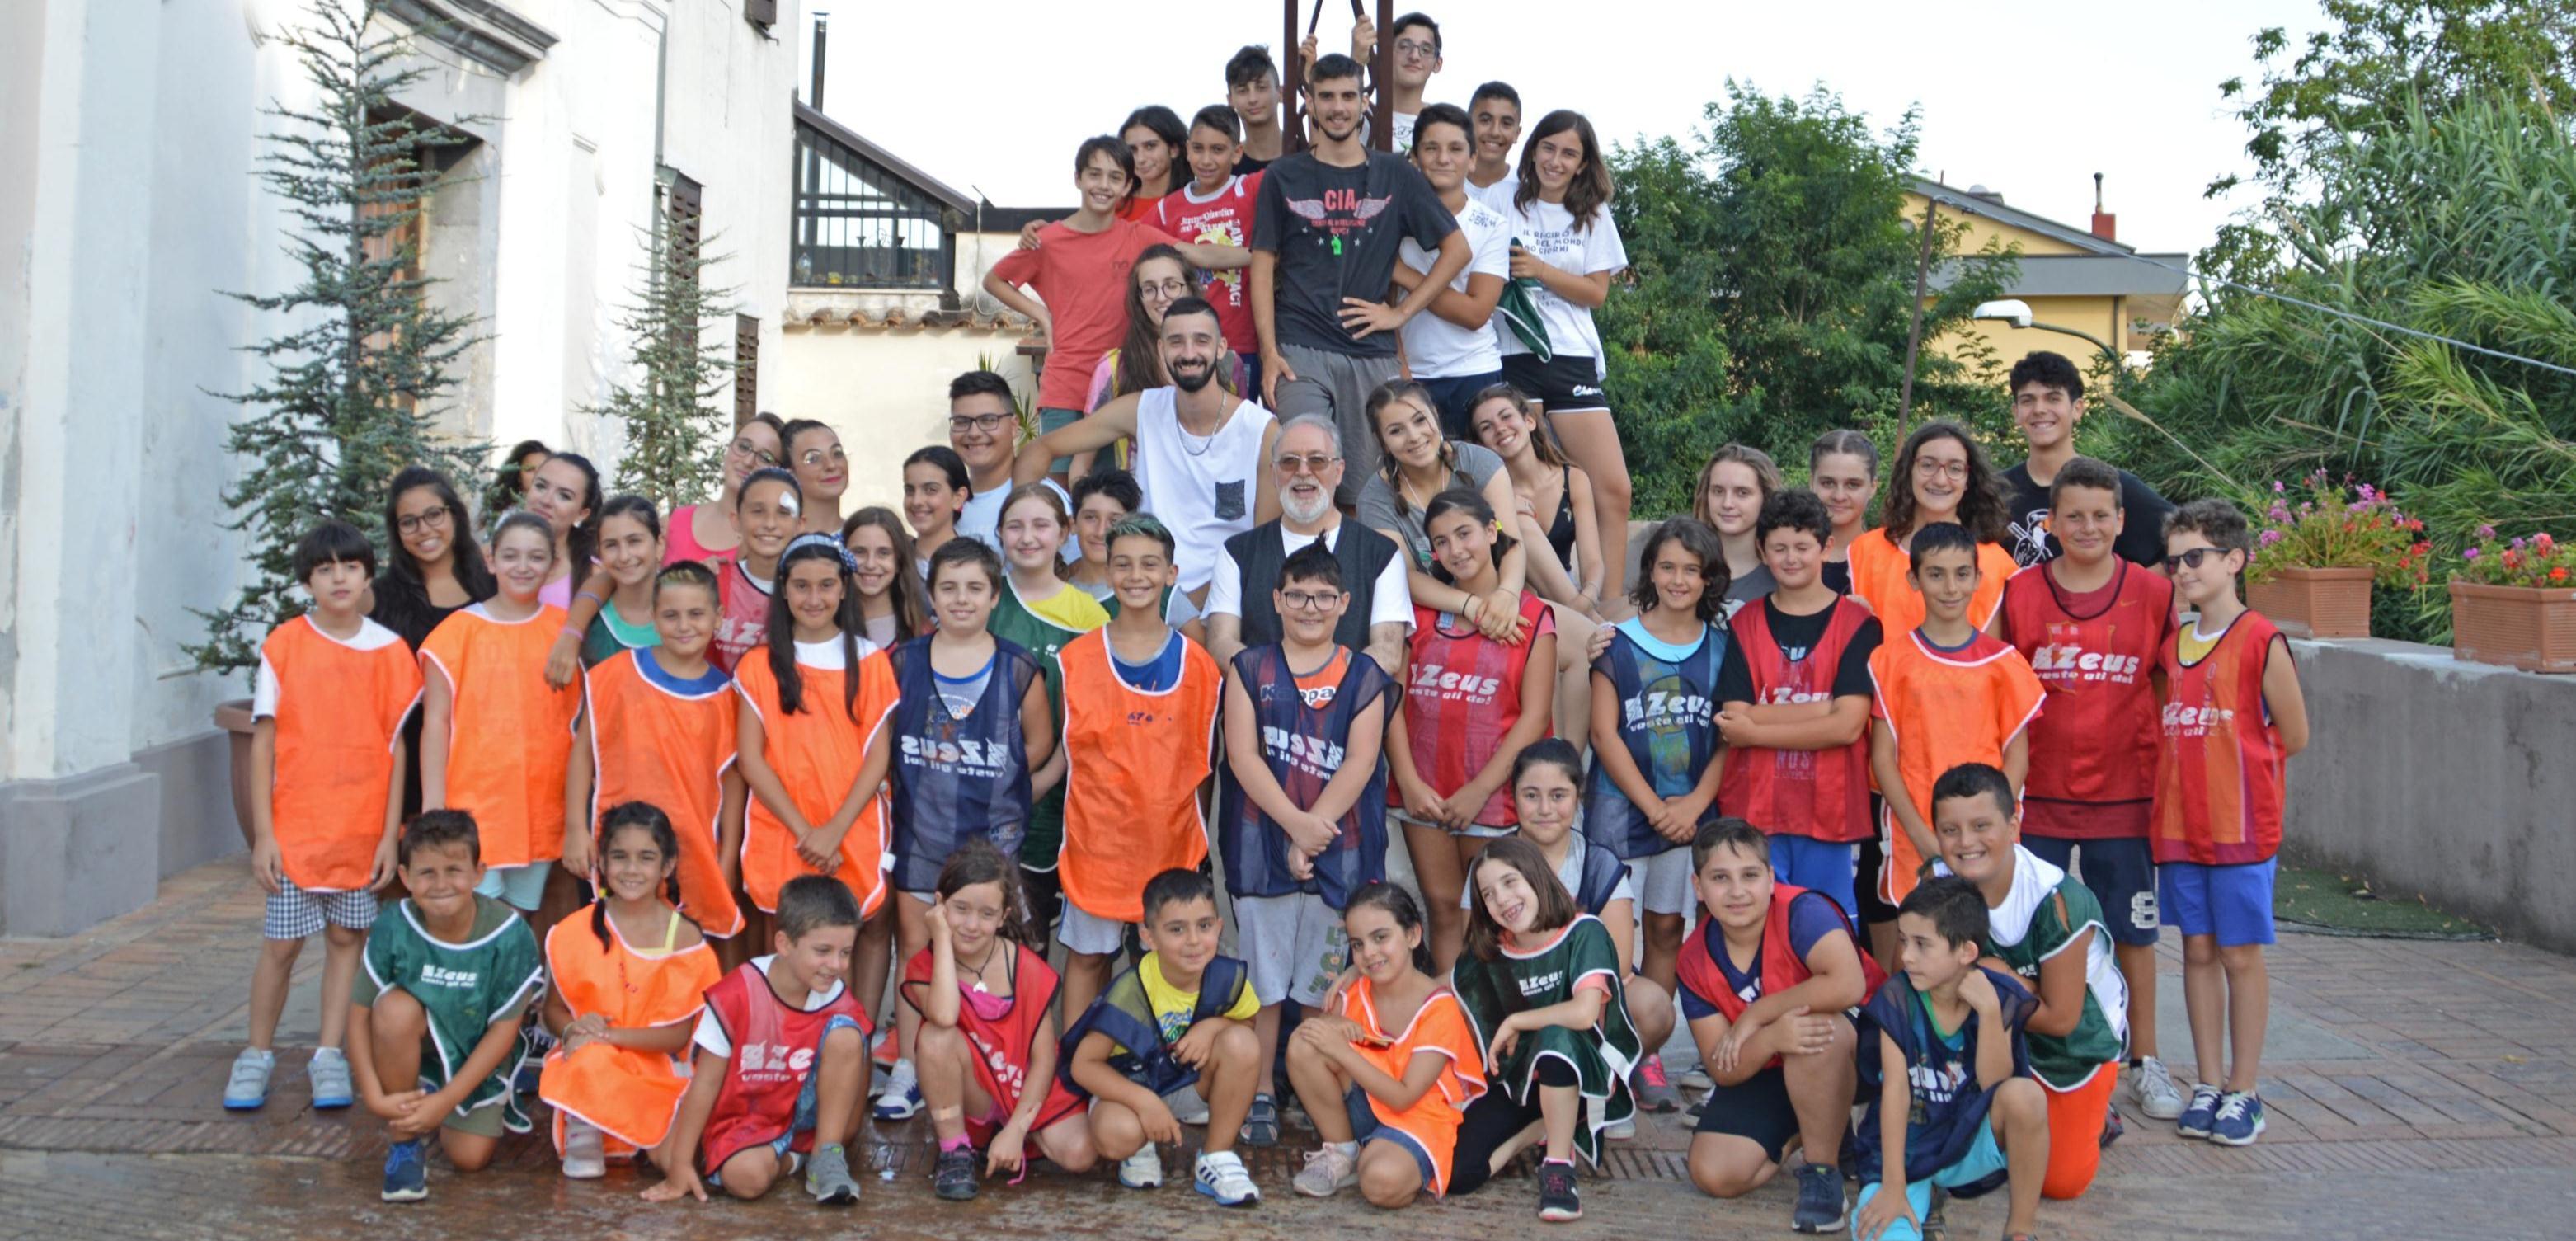 Inside Out Grest 2018 Parrocchia di San Cesario Martire